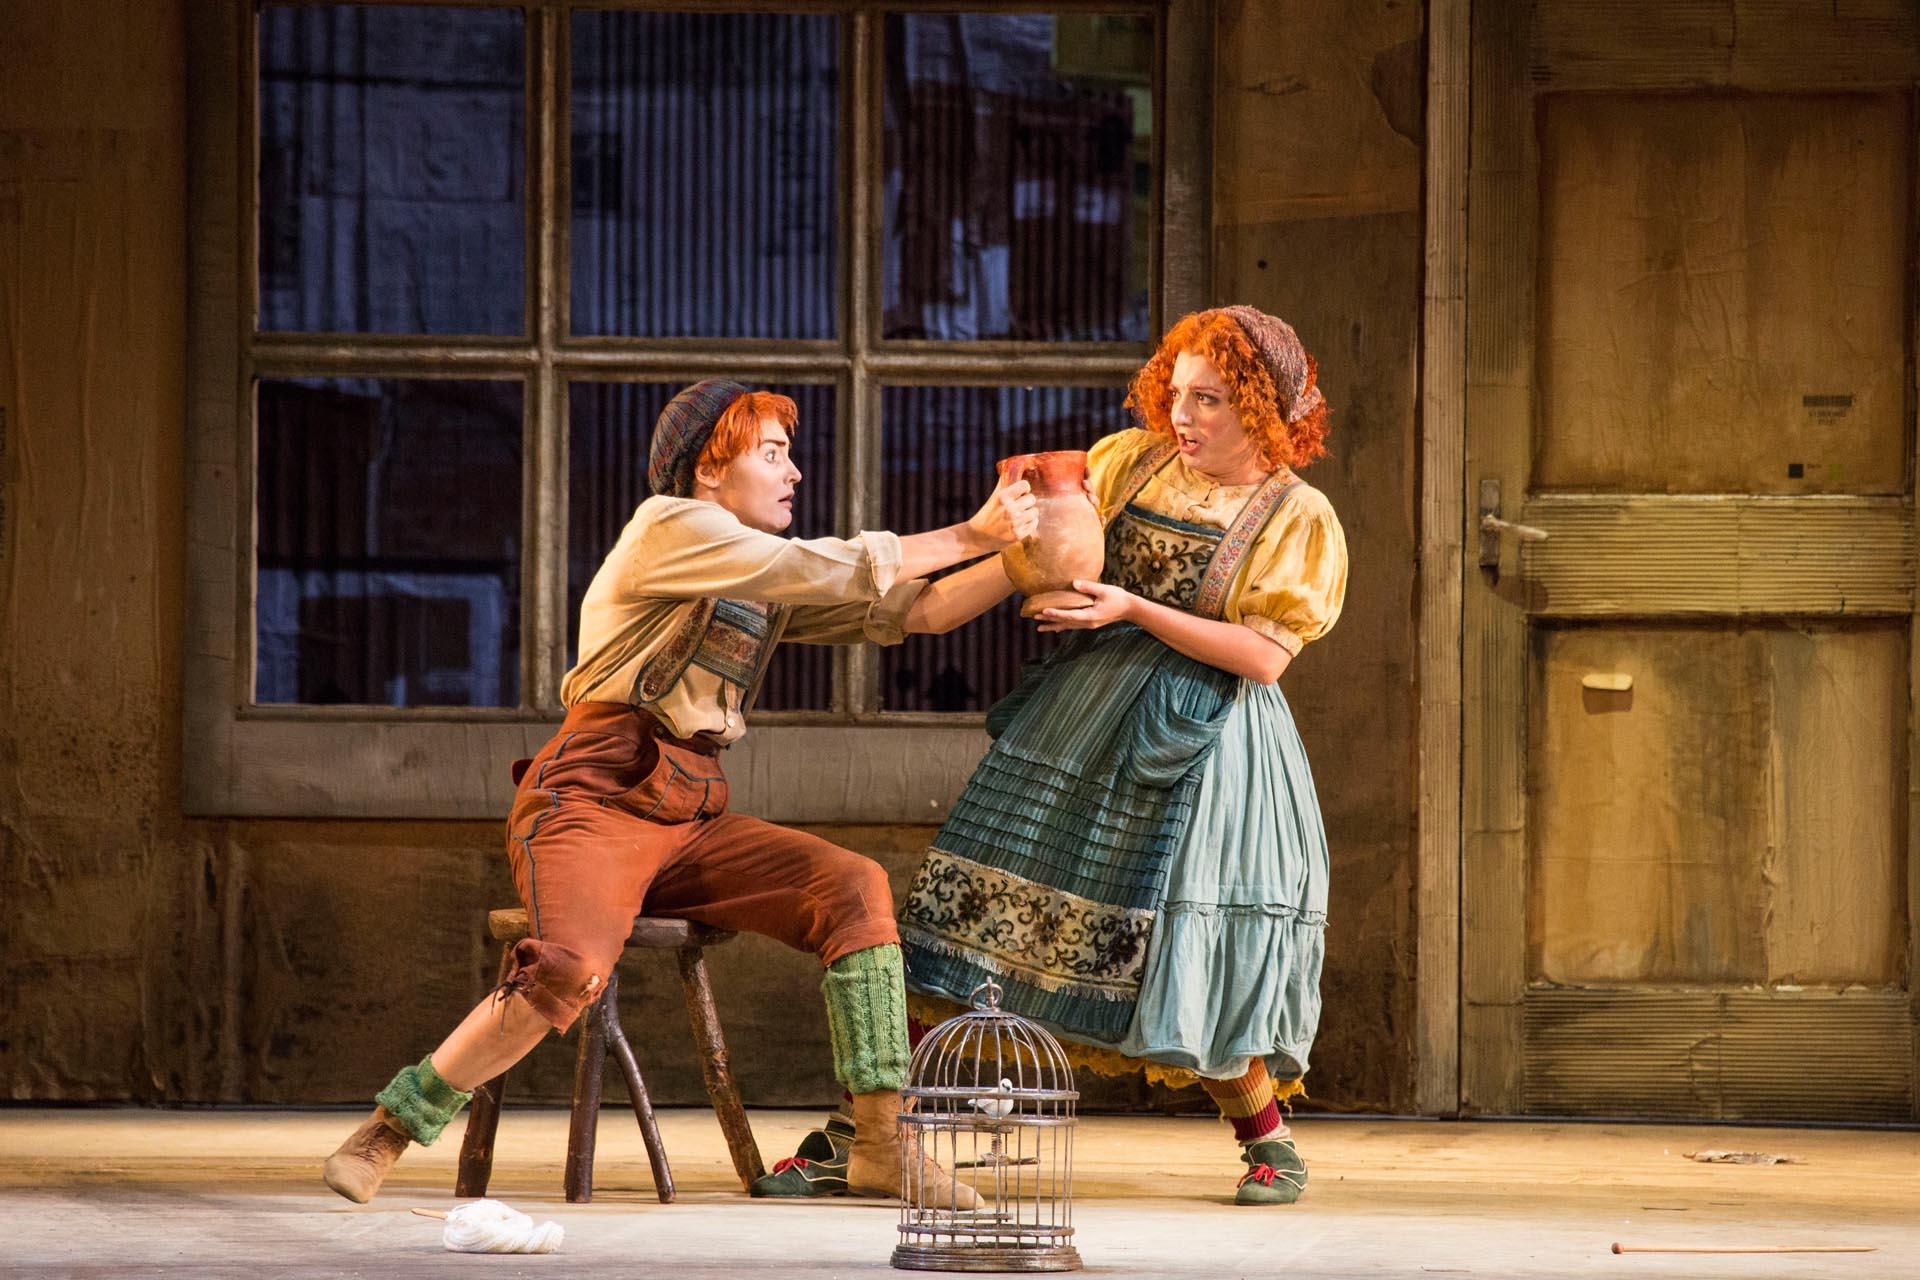 07 Hänsel und Gretel, Teatro alla Scala, 2017, © Brescia und Amisano